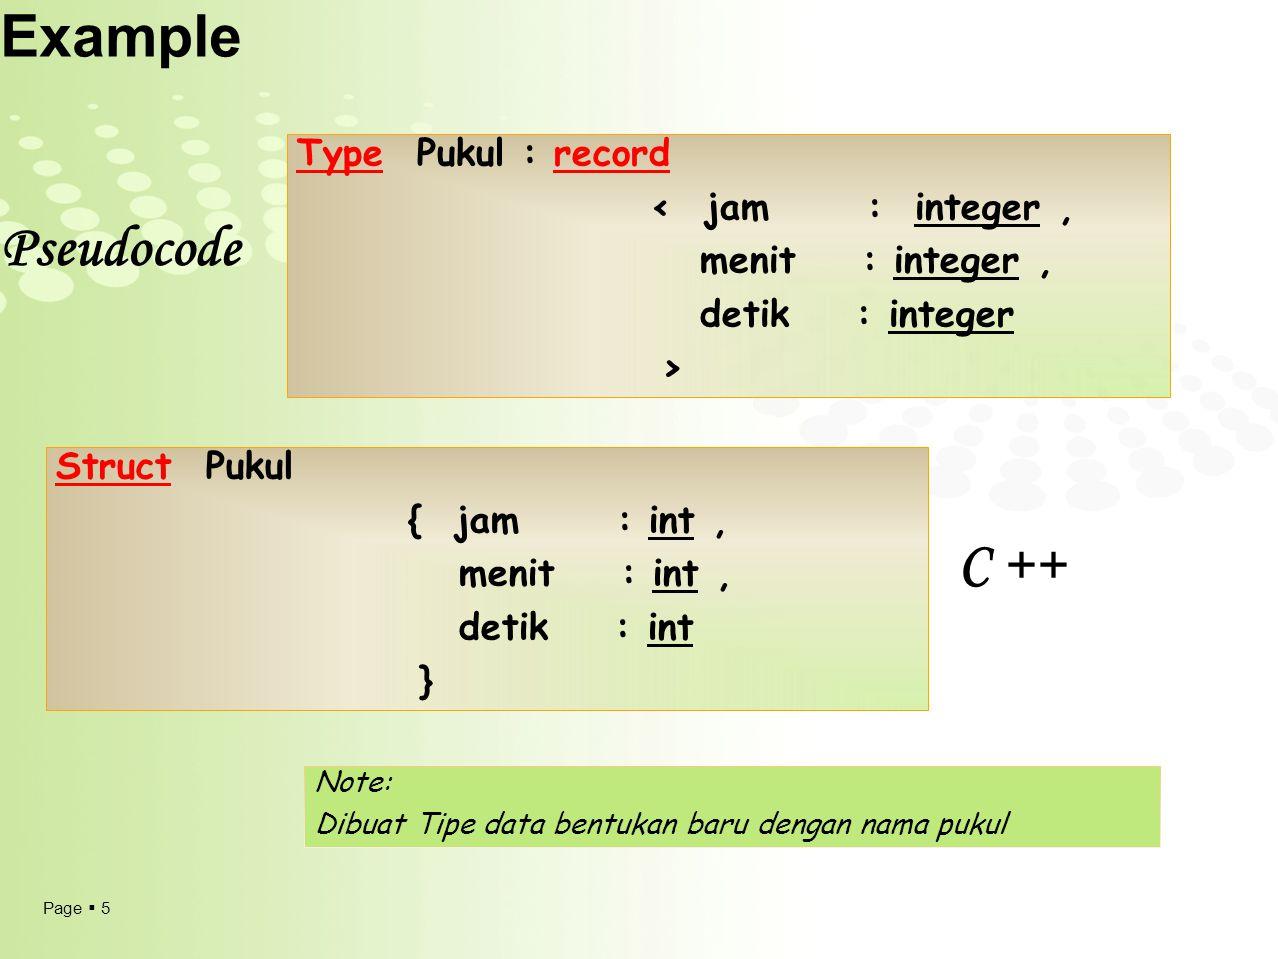 Page  6 Penggunaan dan Pengaksesan Struct JamMasuk : pukul JamPulang,JamIstirahat : pukul Pseudocode Note : pendeklarasian variabel jamMasuk, jamPulang, jamIstirahat dengan tipe data bentukan pukul read(JamMasuk.jam) read(JamMasuk.Menit,JamMasuk.Detik,JamMasuk.Detik) Pseudocode Note : Baca data dari piranti masukan dan nilainya dimasukkan ke variabel.